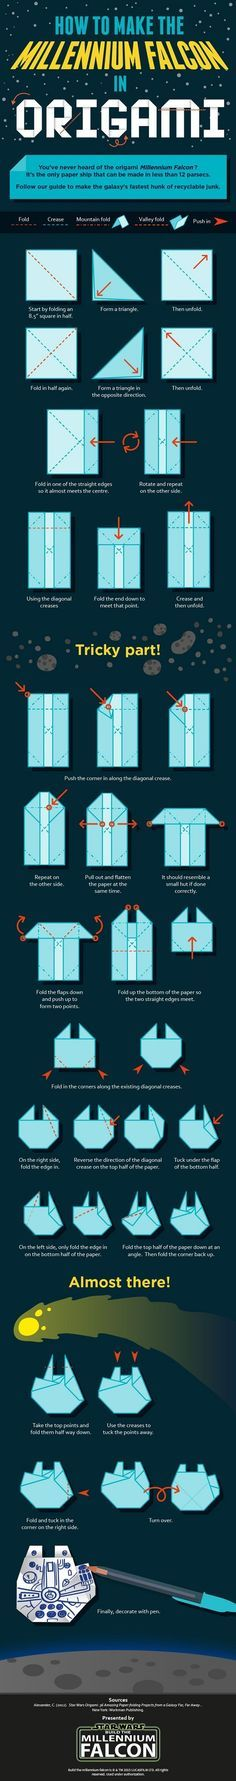 Infographic: Make Your Own Origami Millennium Falcon - DesignTAXI.com